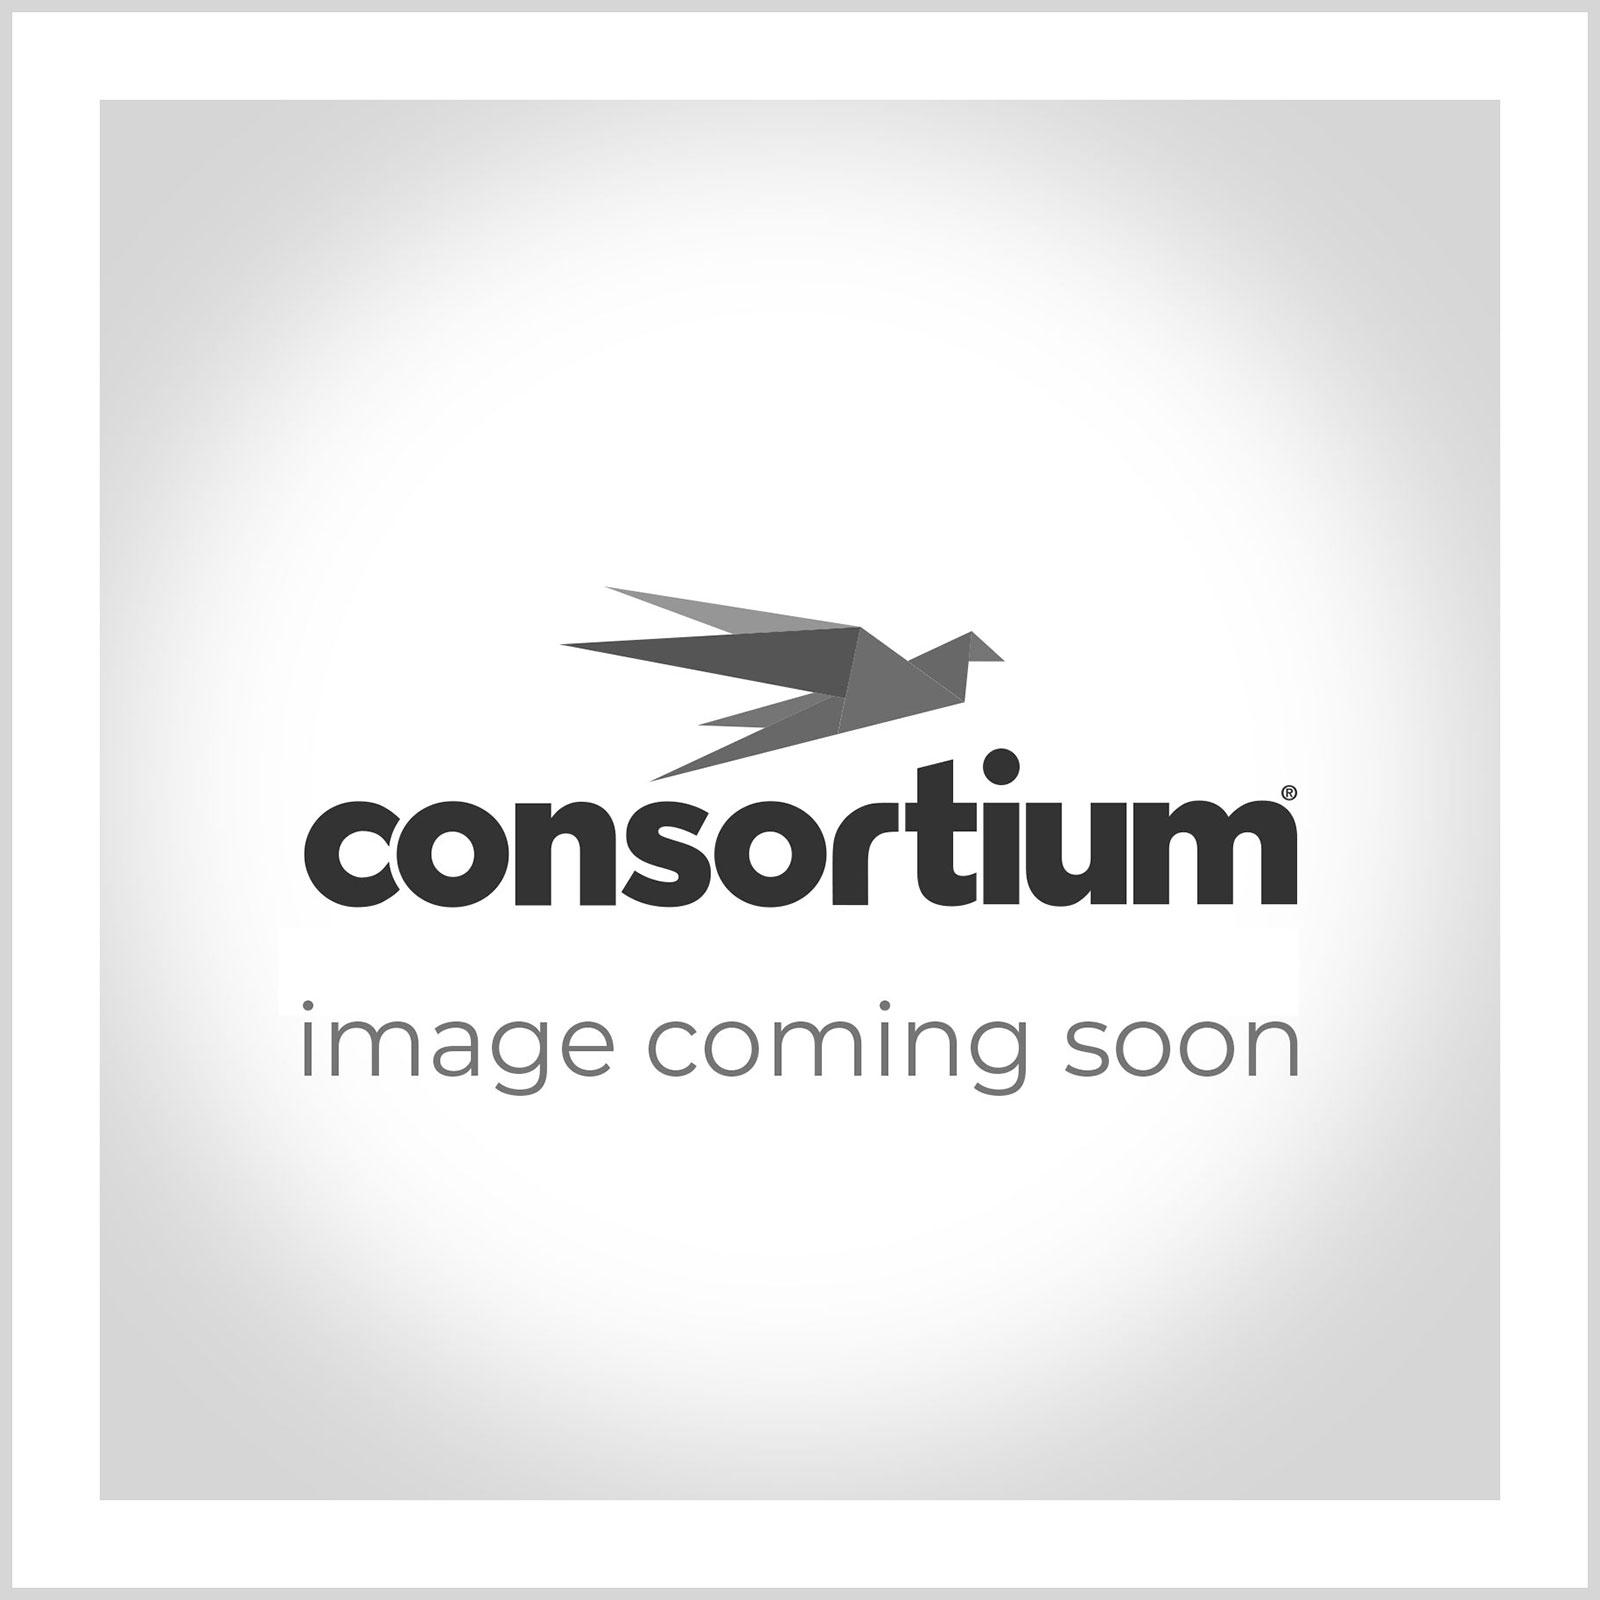 PVC Edge Crushbent Rectangular Tables 1100mm(w) x 550mm(d)